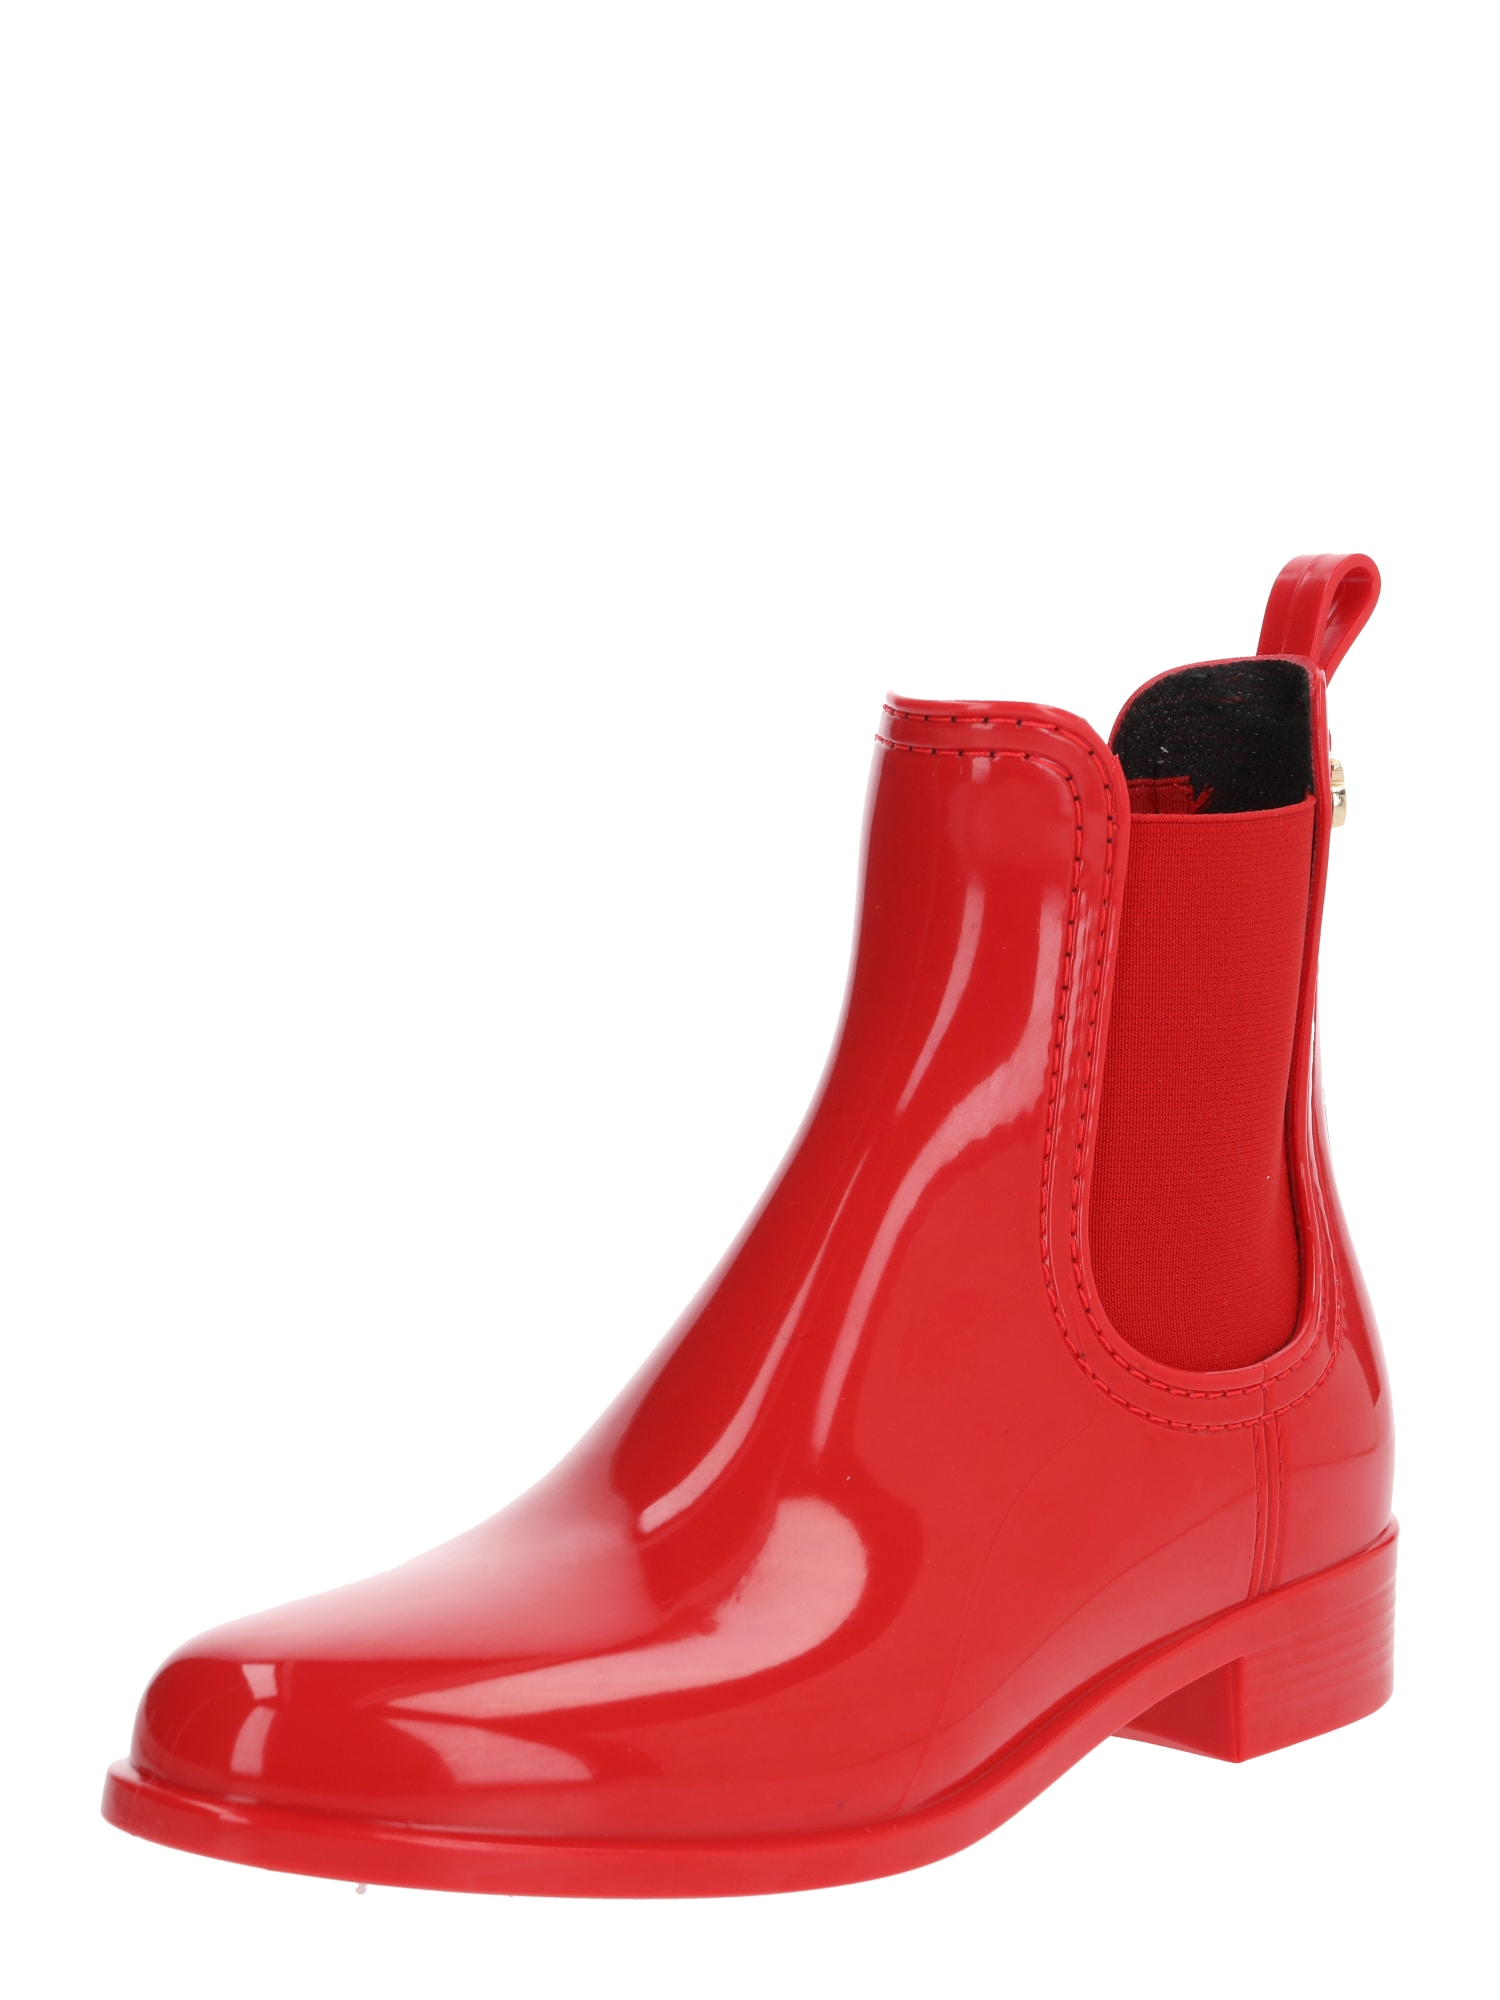 LEMON JELLY Cizme de cauciuc 'Comfy'  roșu